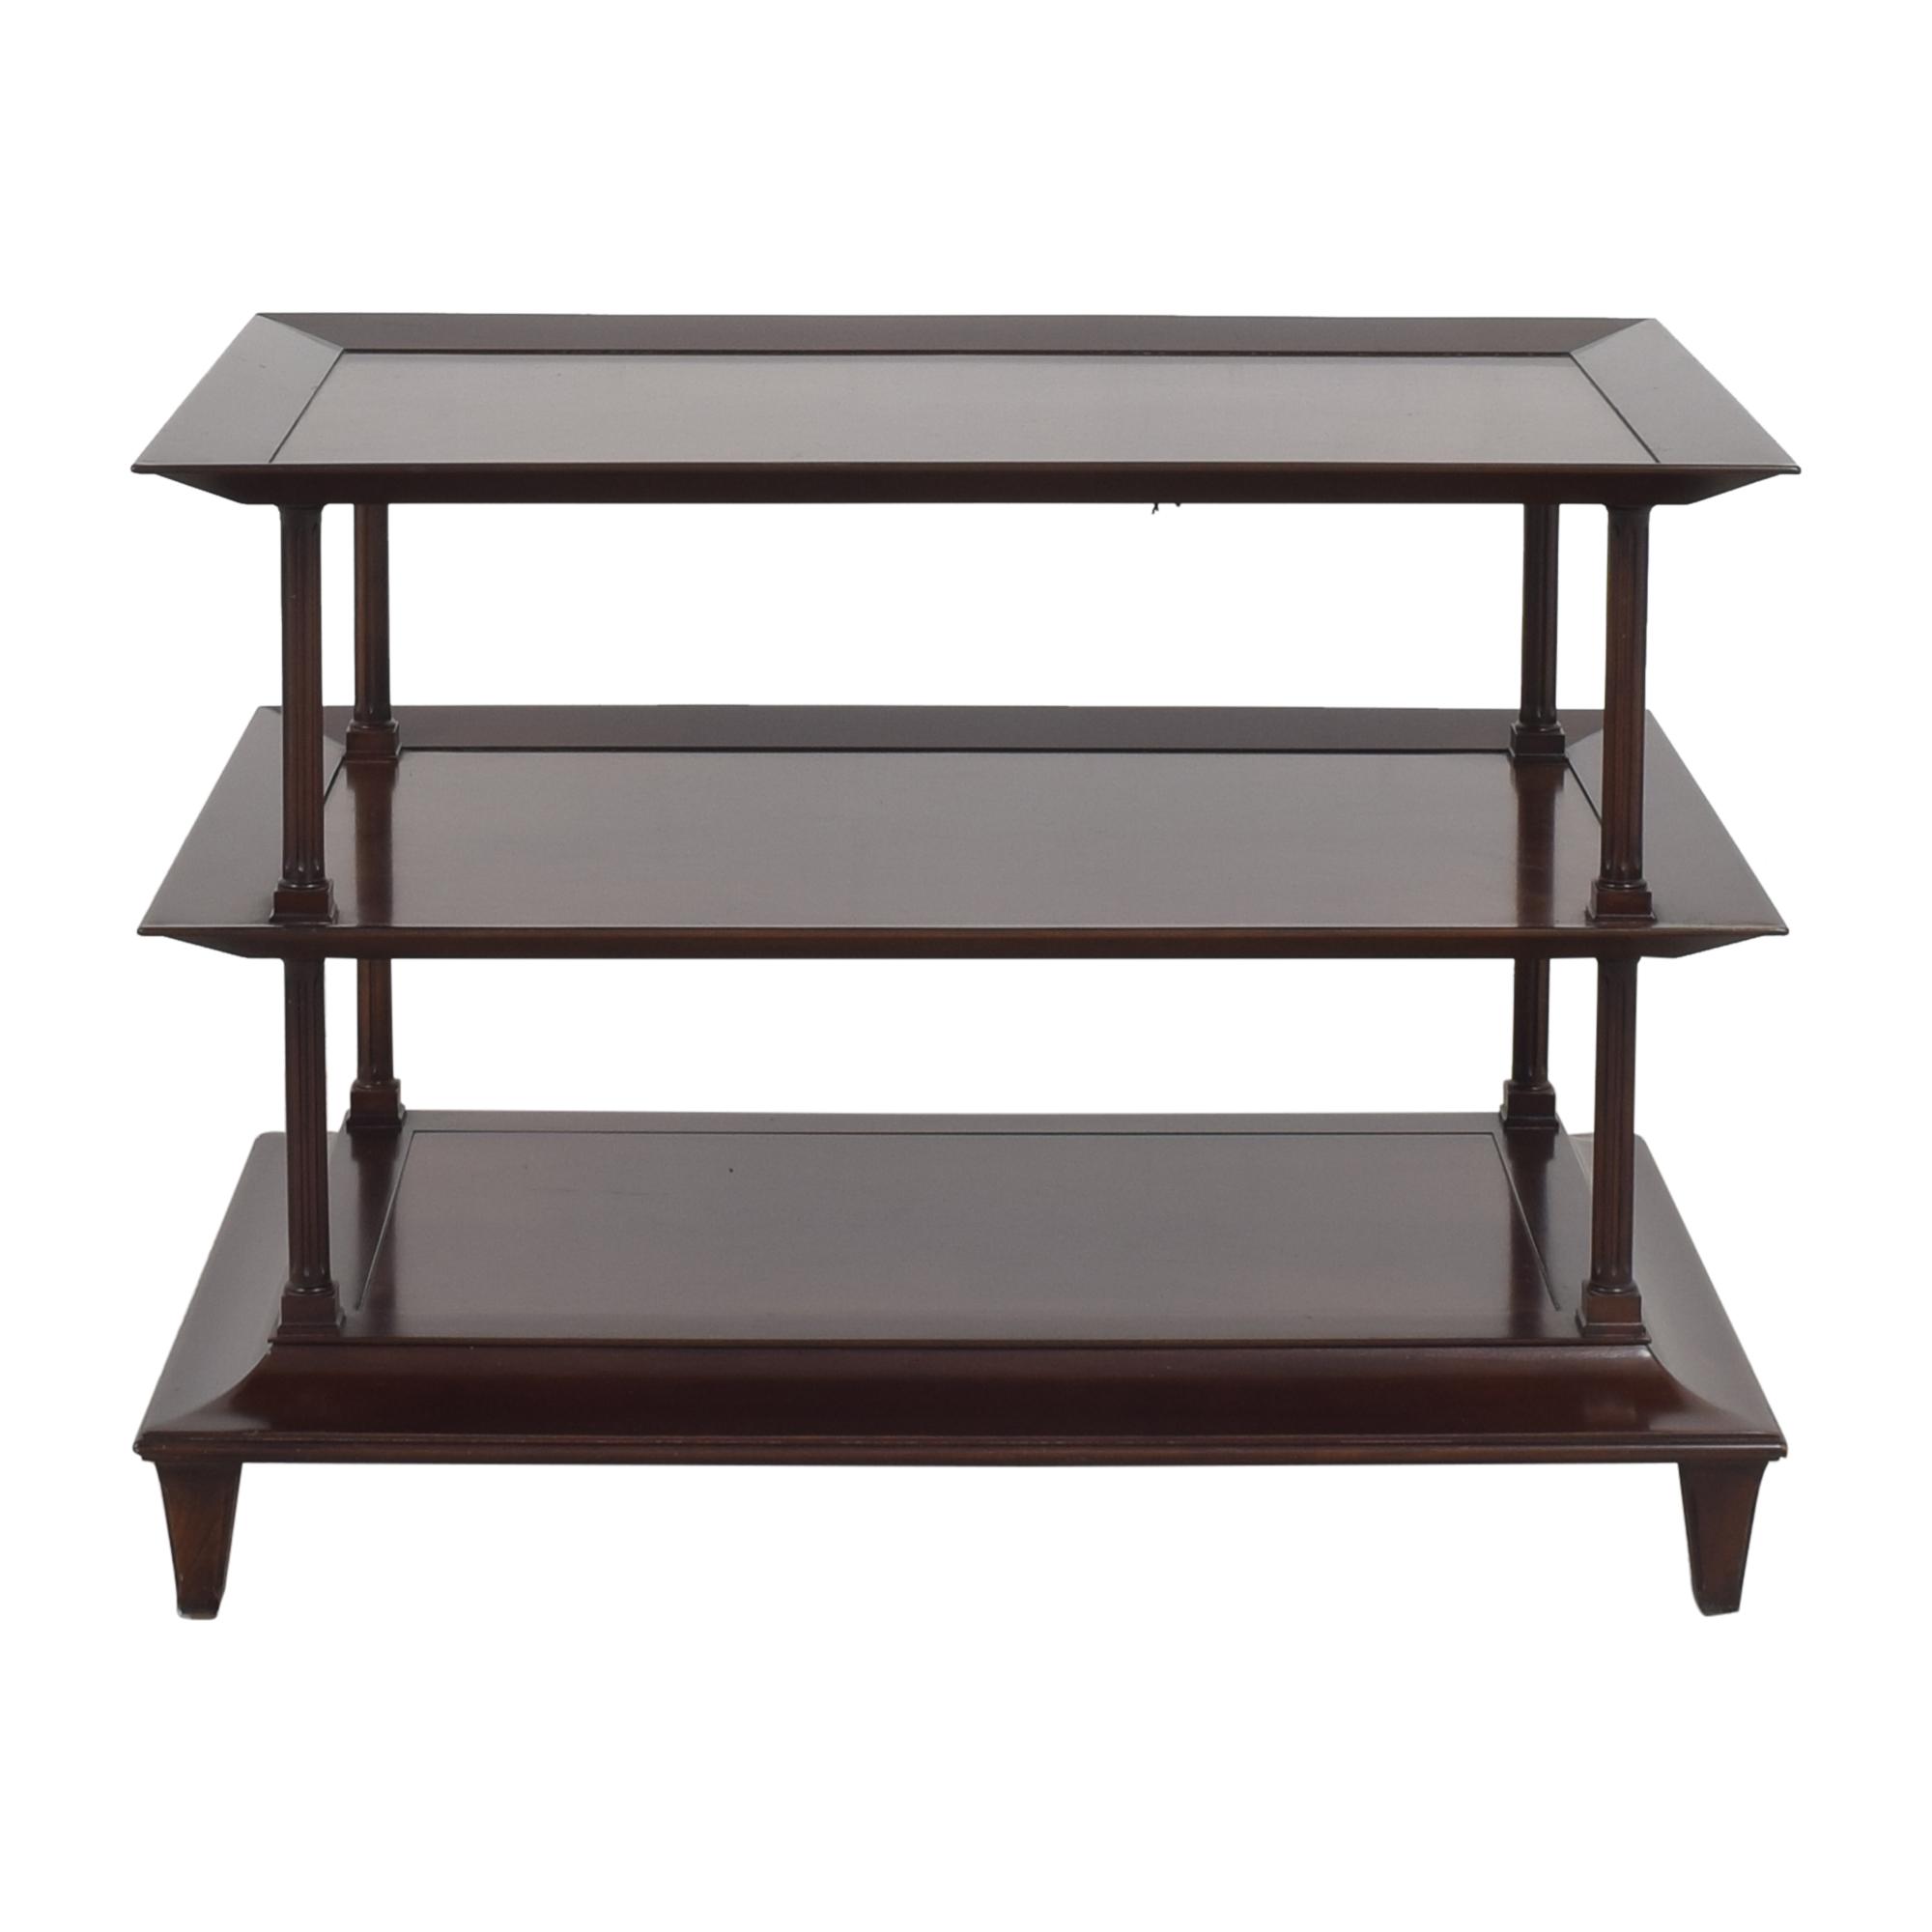 Baker Furniture Baker Furniture Kashmir Three Tier Accent Table for sale